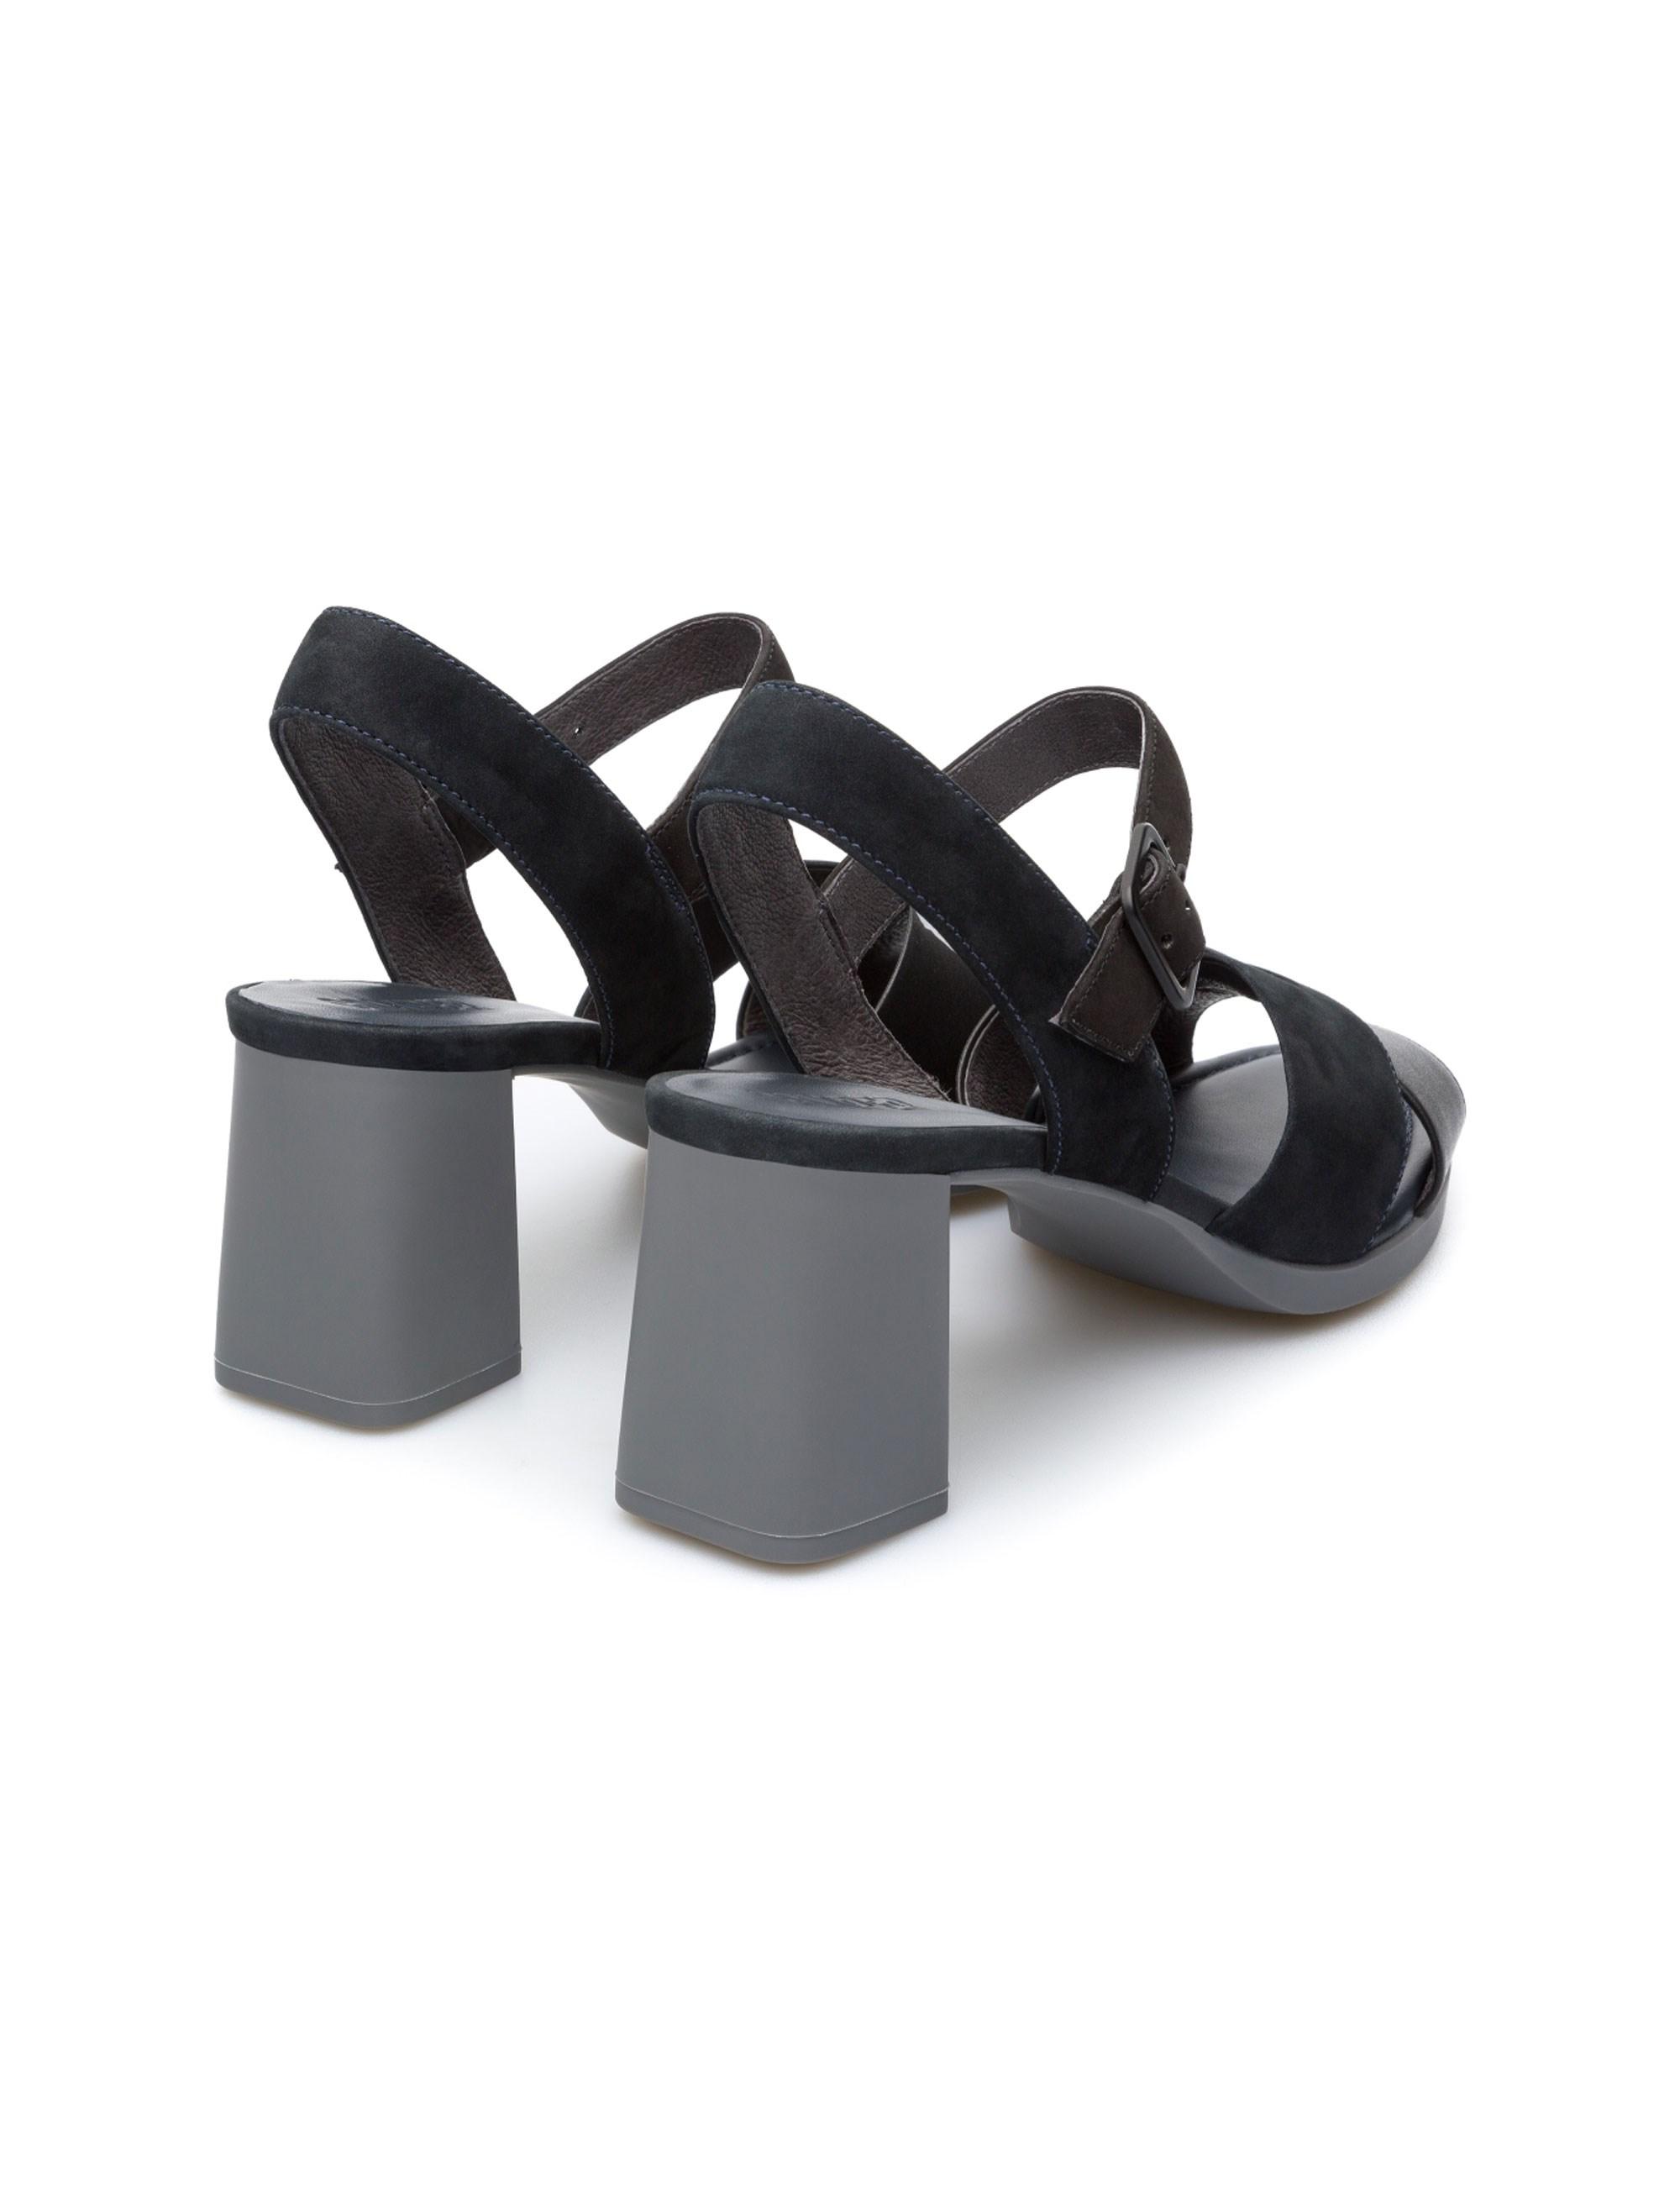 کفش پاشنه بلند چرم زنانه Kara - کمپر - مشکي - 3